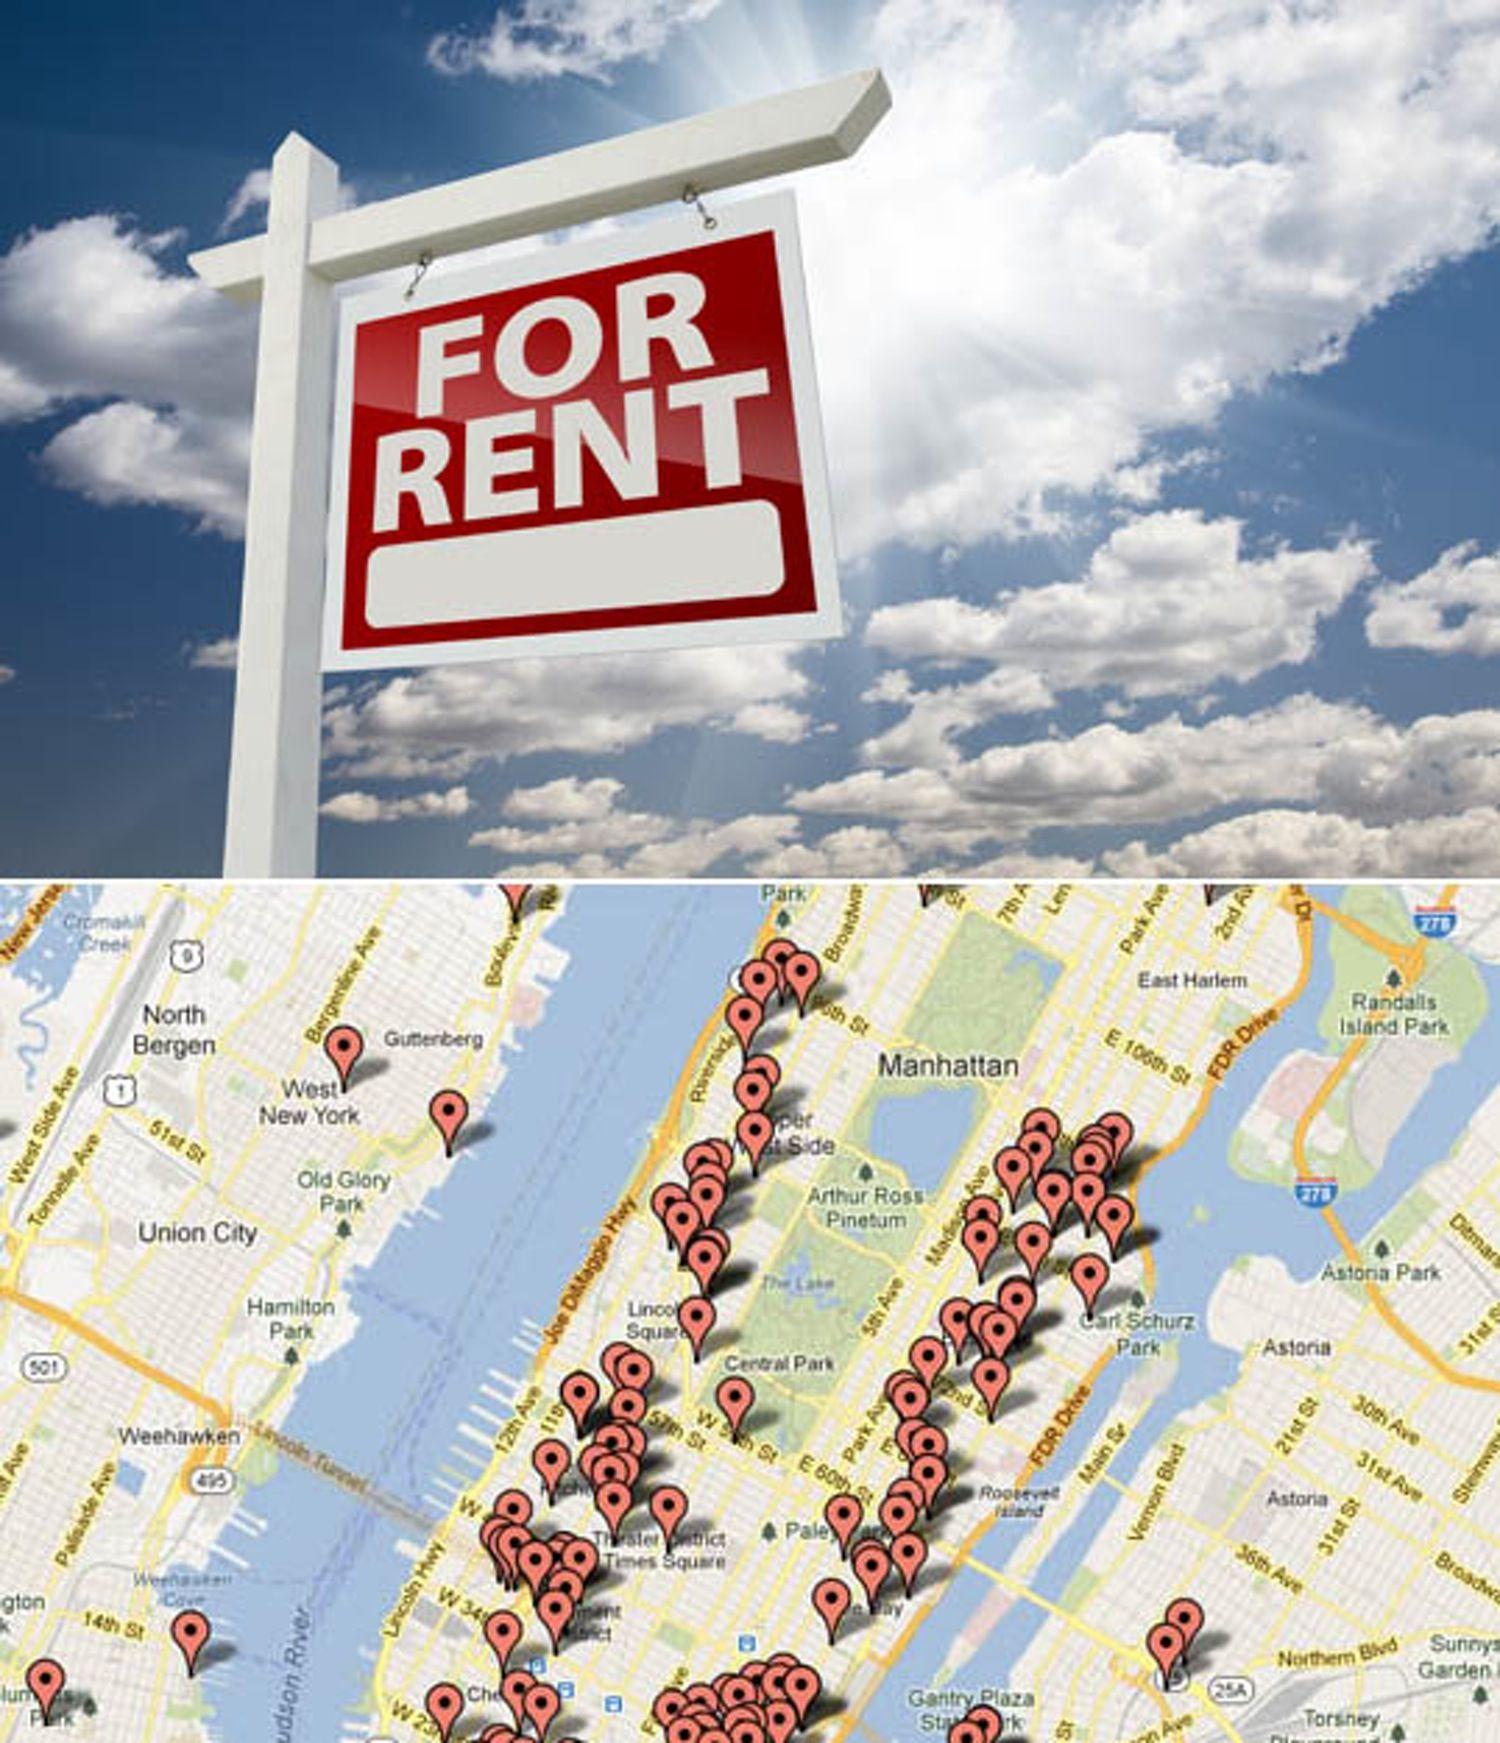 Apartment Hunting Low Tech vs HiTech Apartment hunting